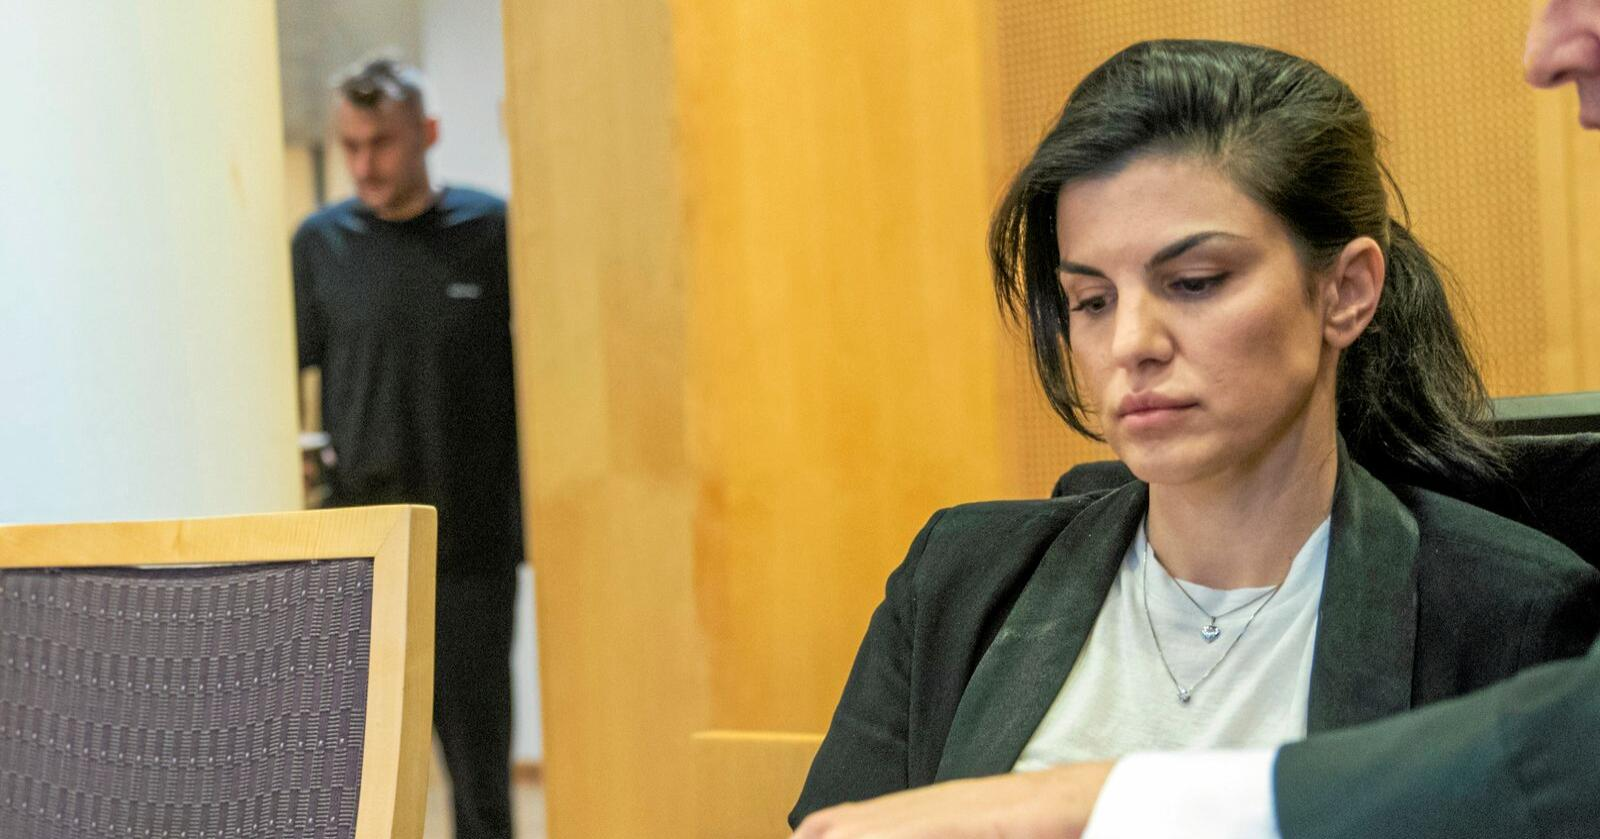 Aylar Lie møtte ekskjæresten Petter Northug i retten tidligere i år. Foto: Terje Pedersen / NTB scanpix